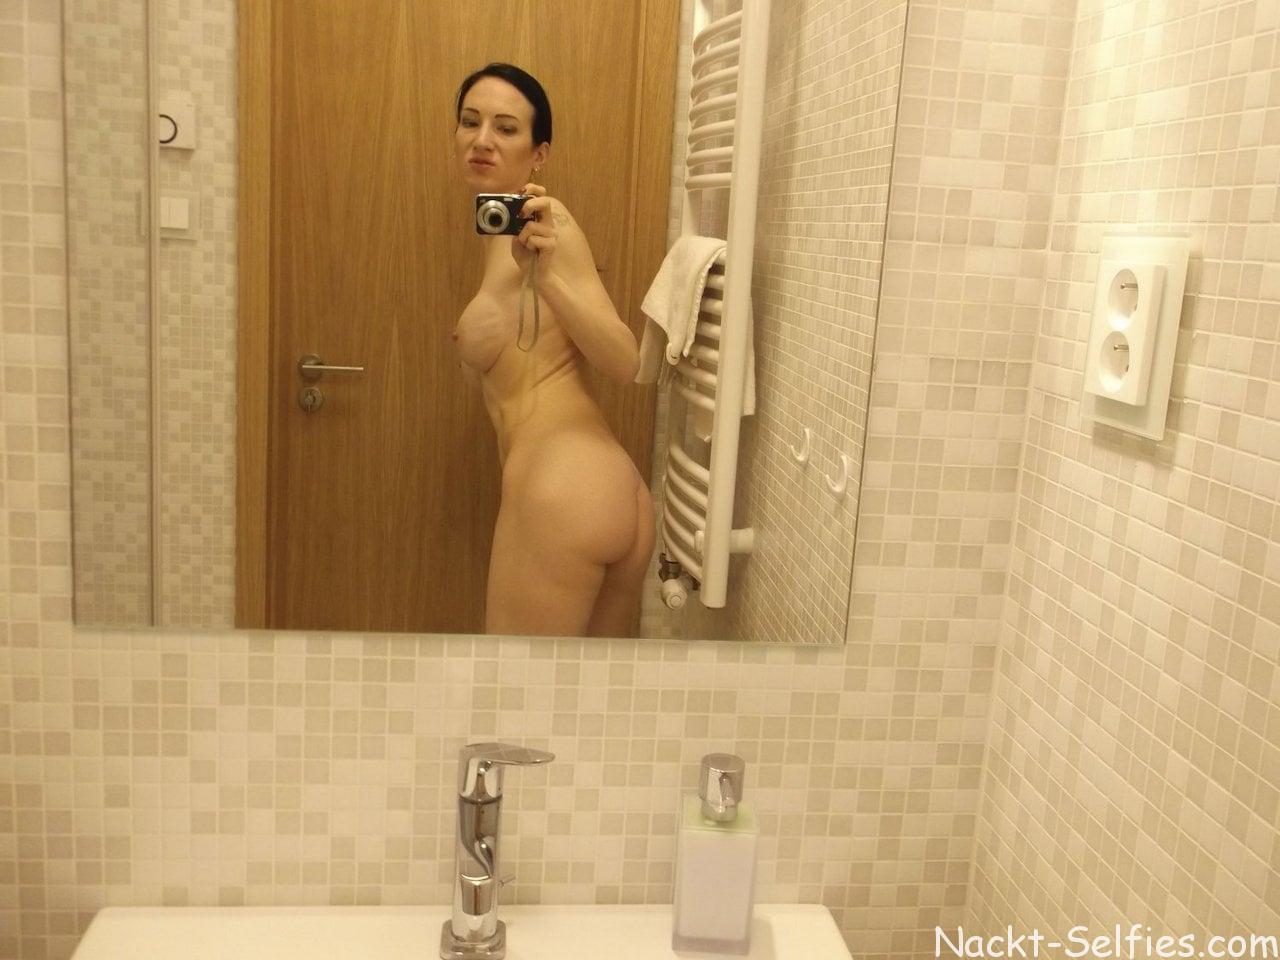 Amateur Nackt Selfie Alissa 08